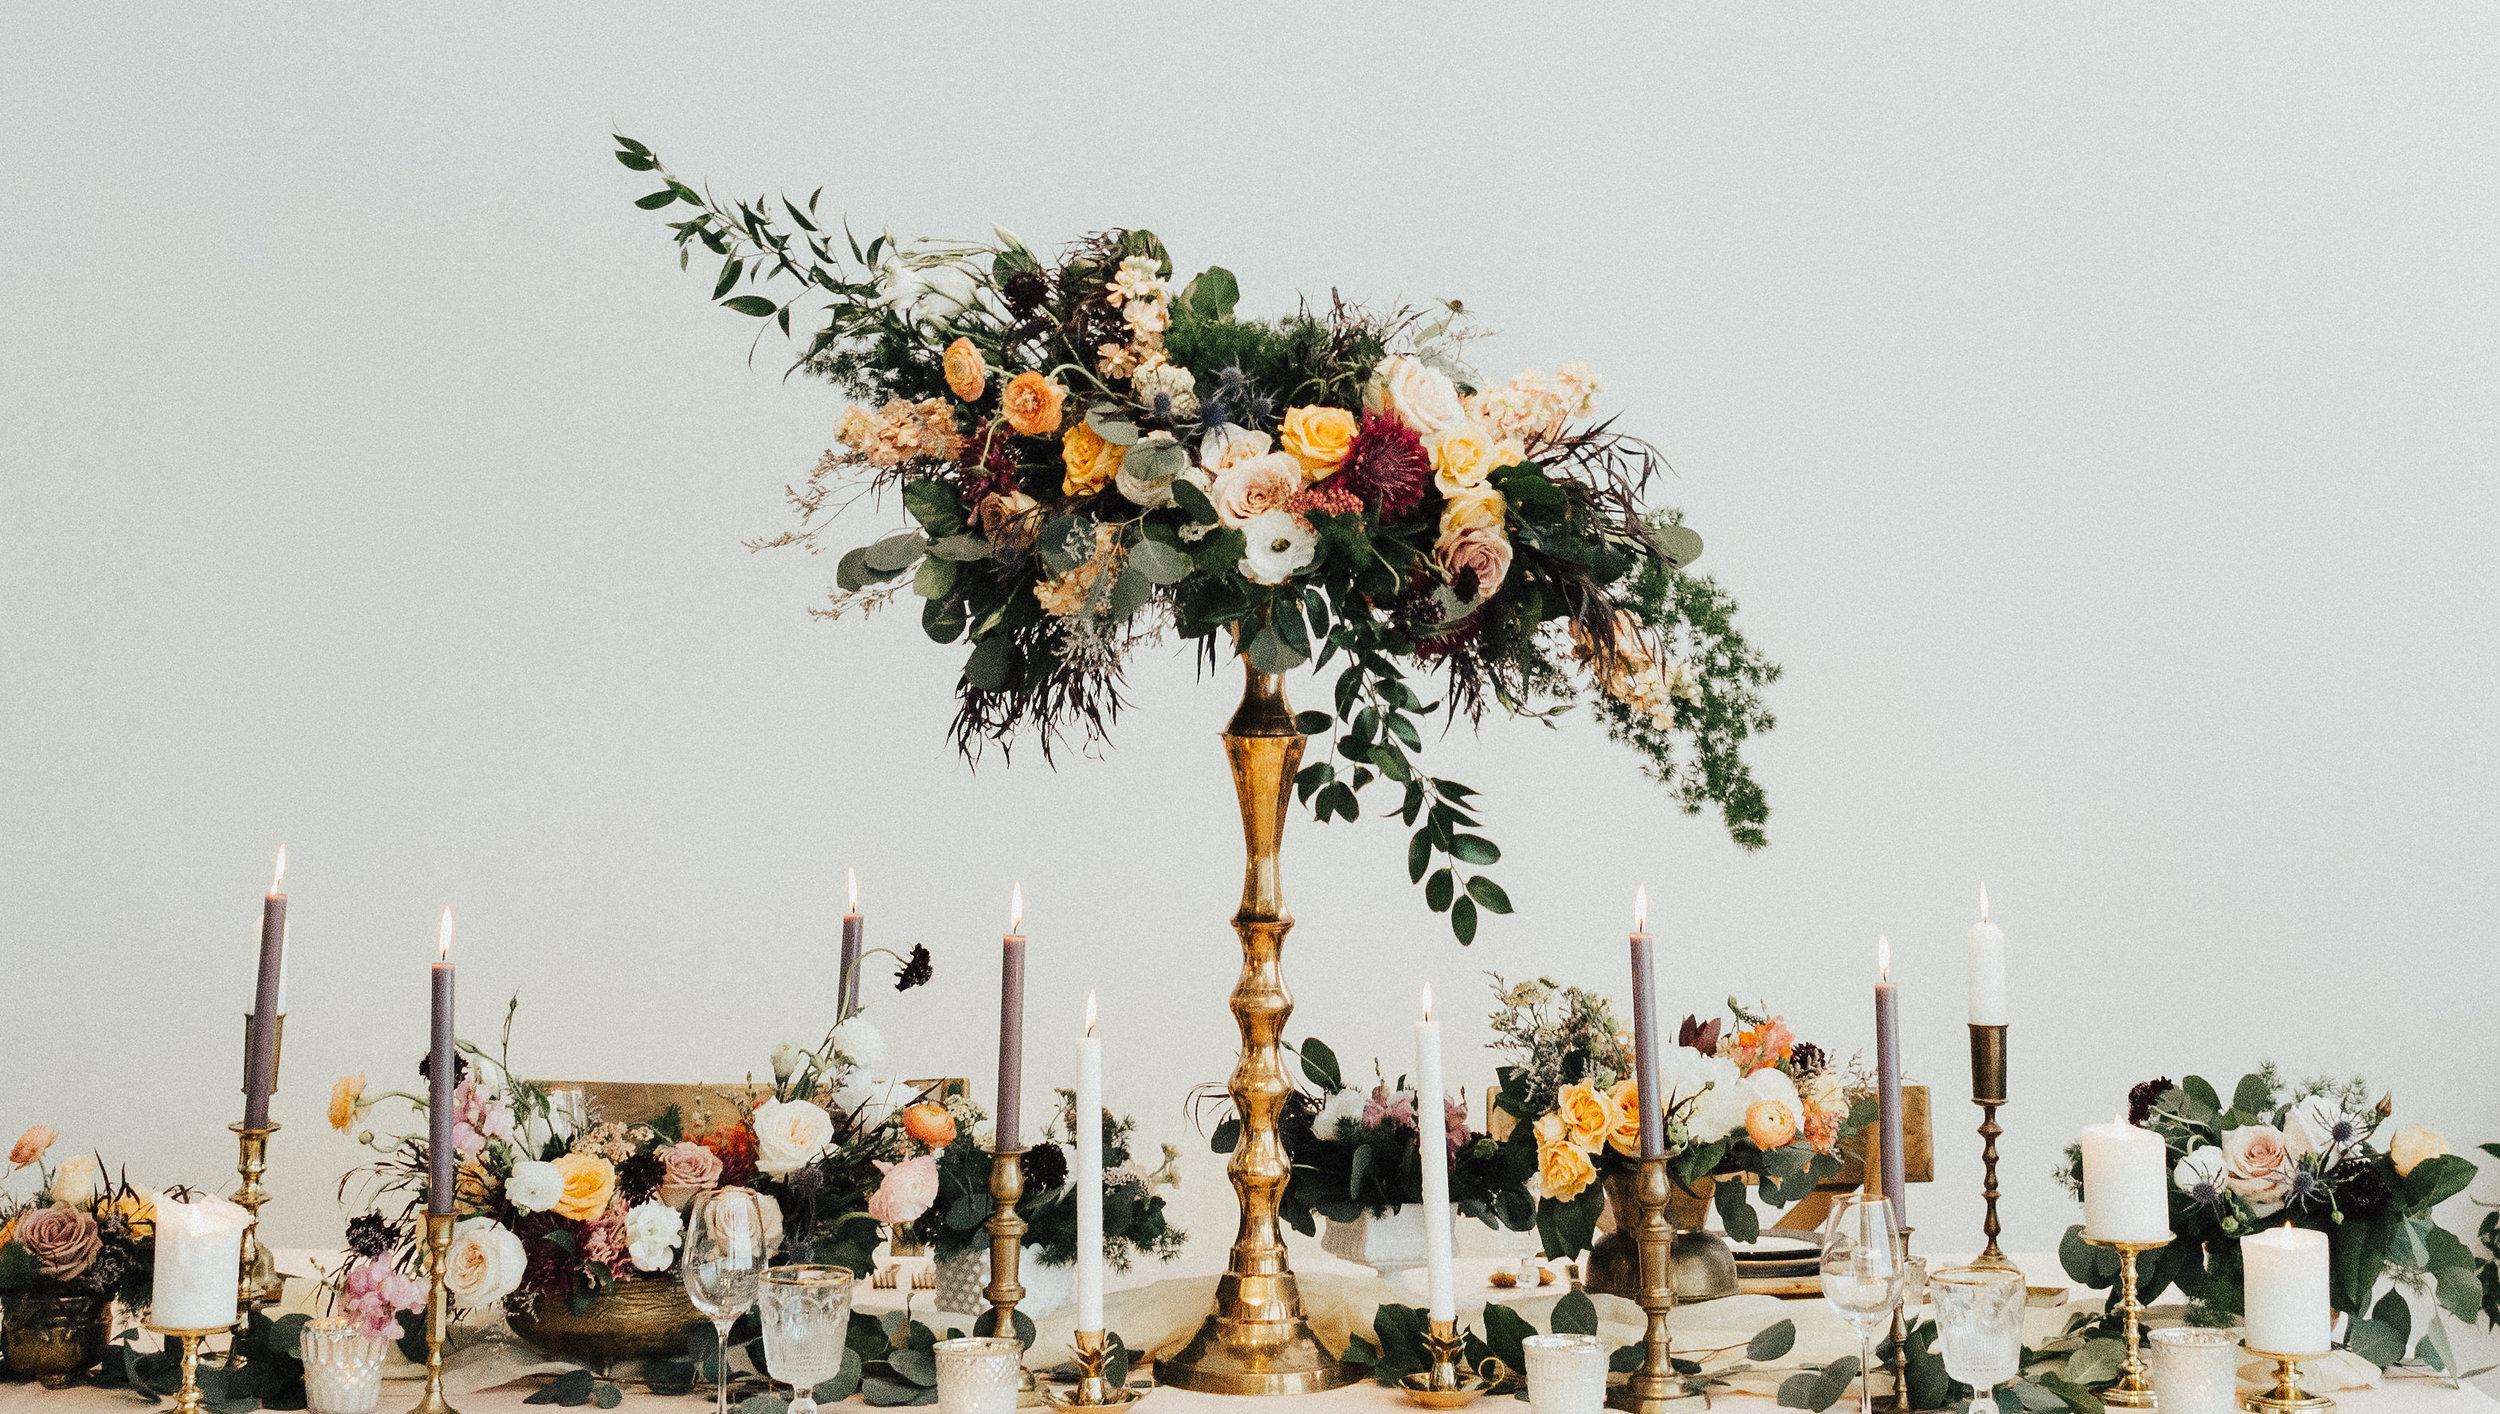 kcmo wedding florist heart + soul the abbott kc kc florist kc wedding florist